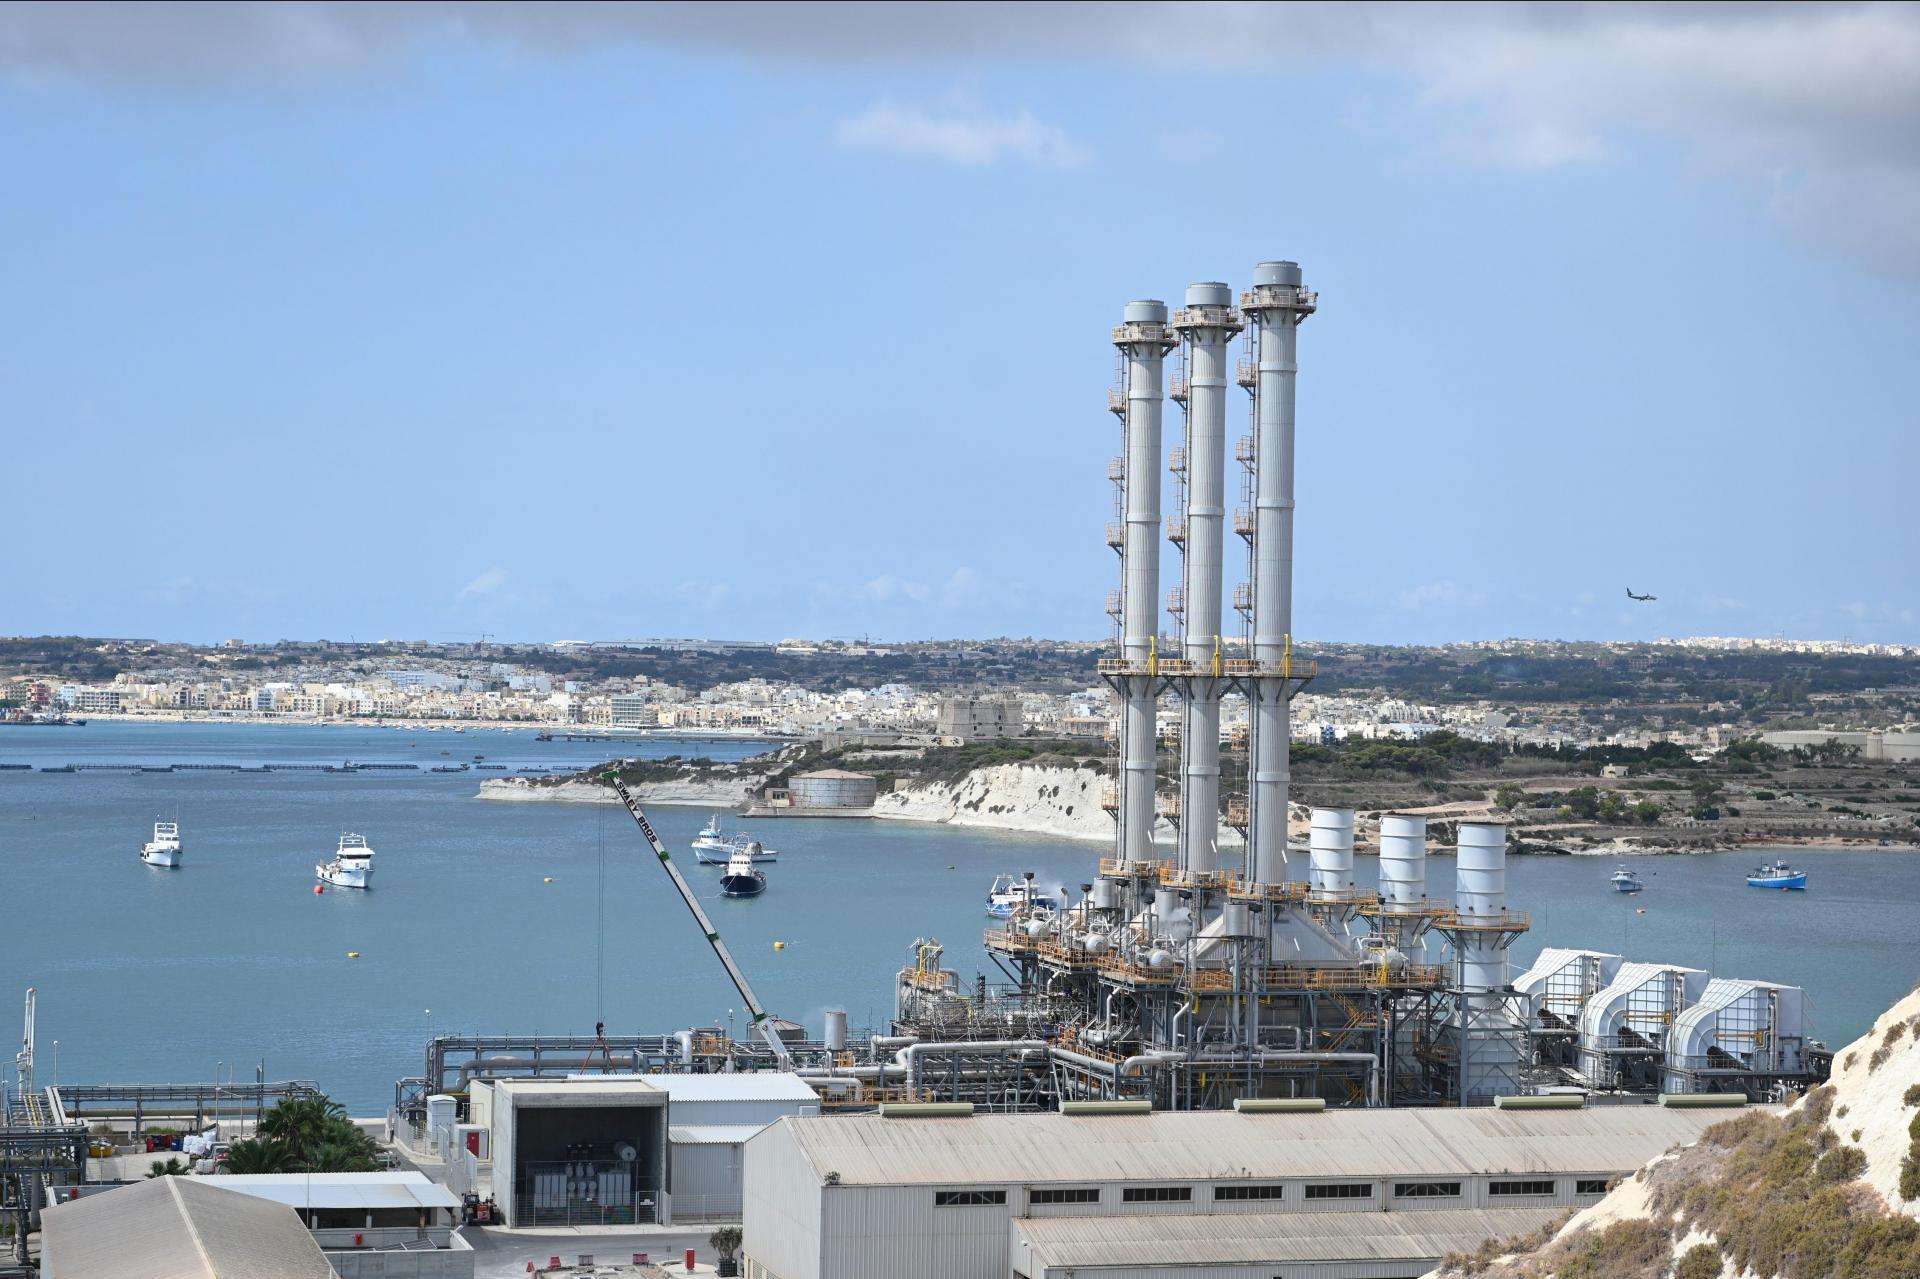 The Electrogas power station in Delimara. Photo: Matthew Mirabelli